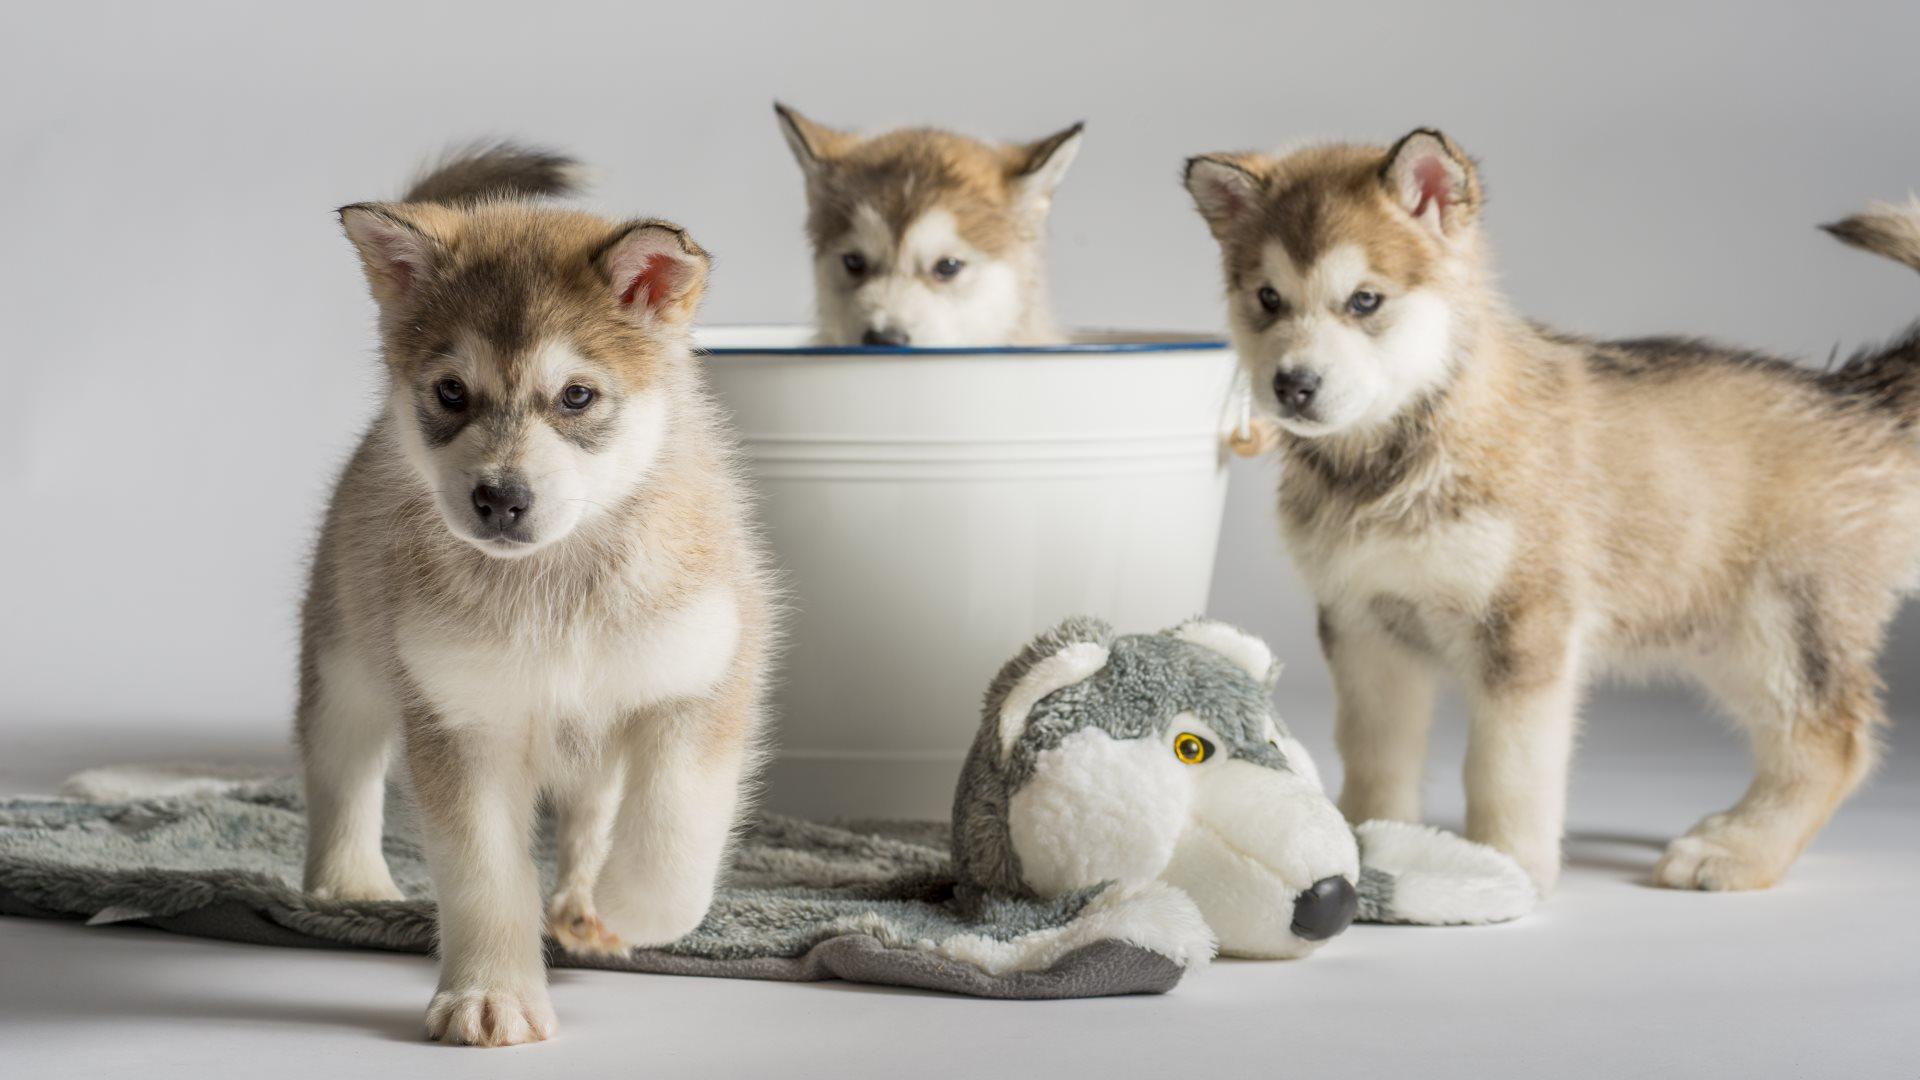 puppies wallpaper hd 235 - photo #27